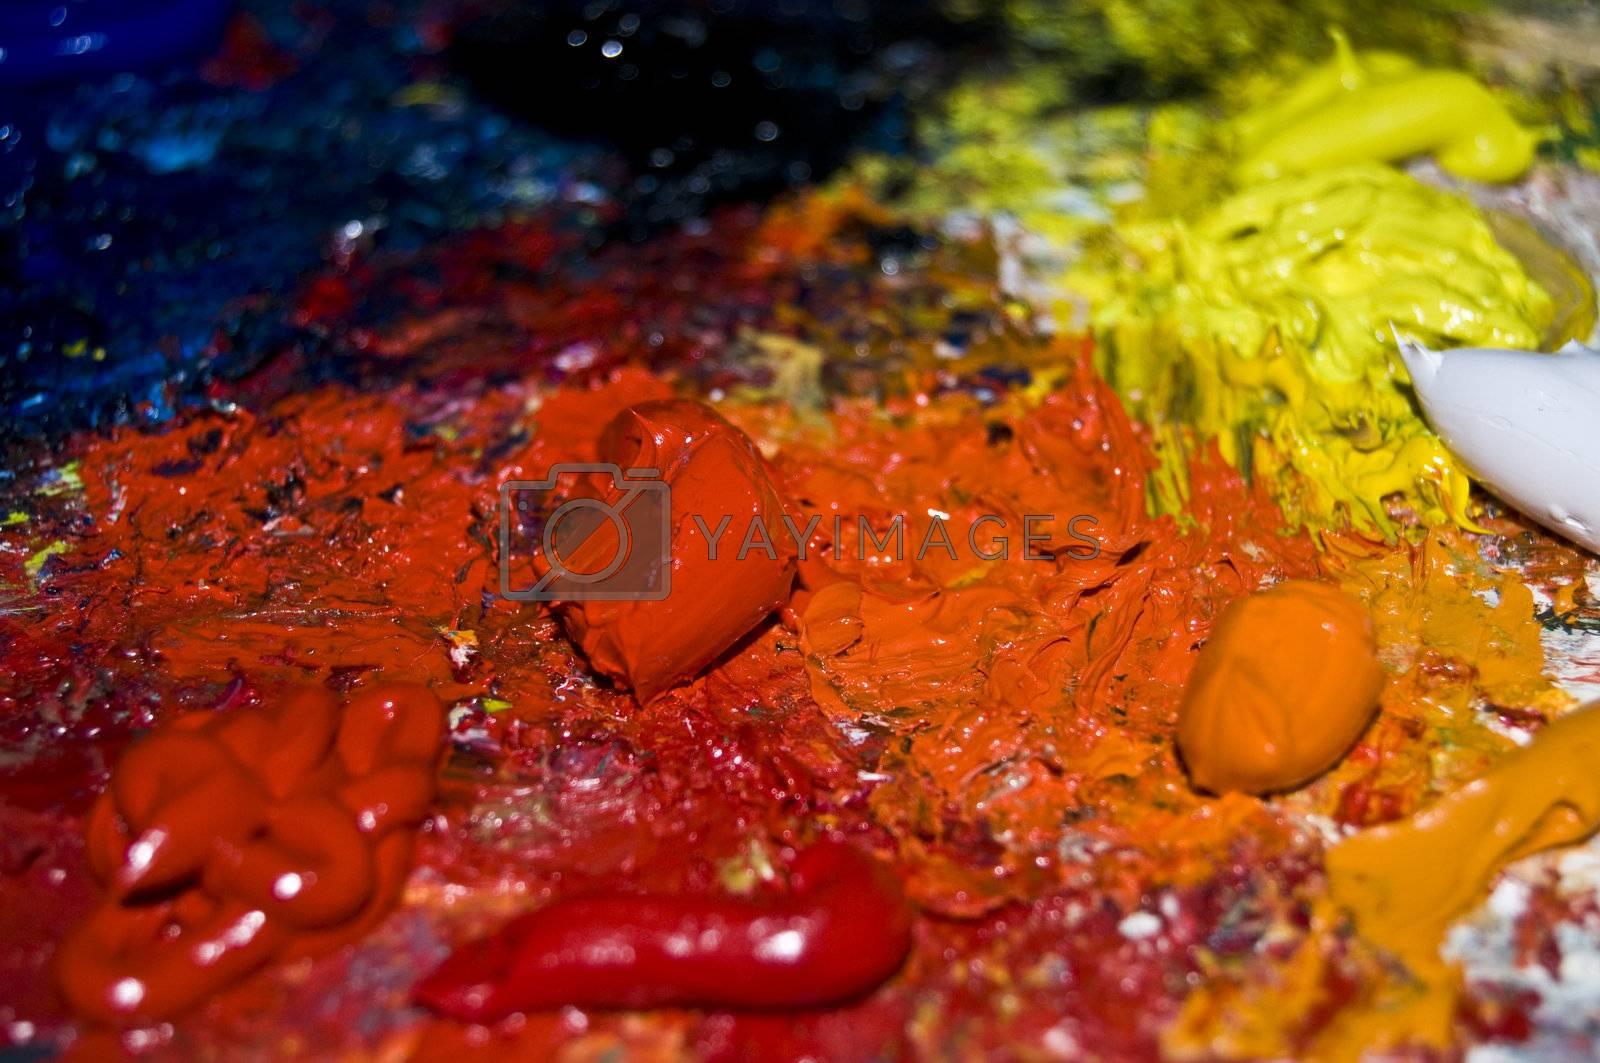 Color palette by Jule_Berlin